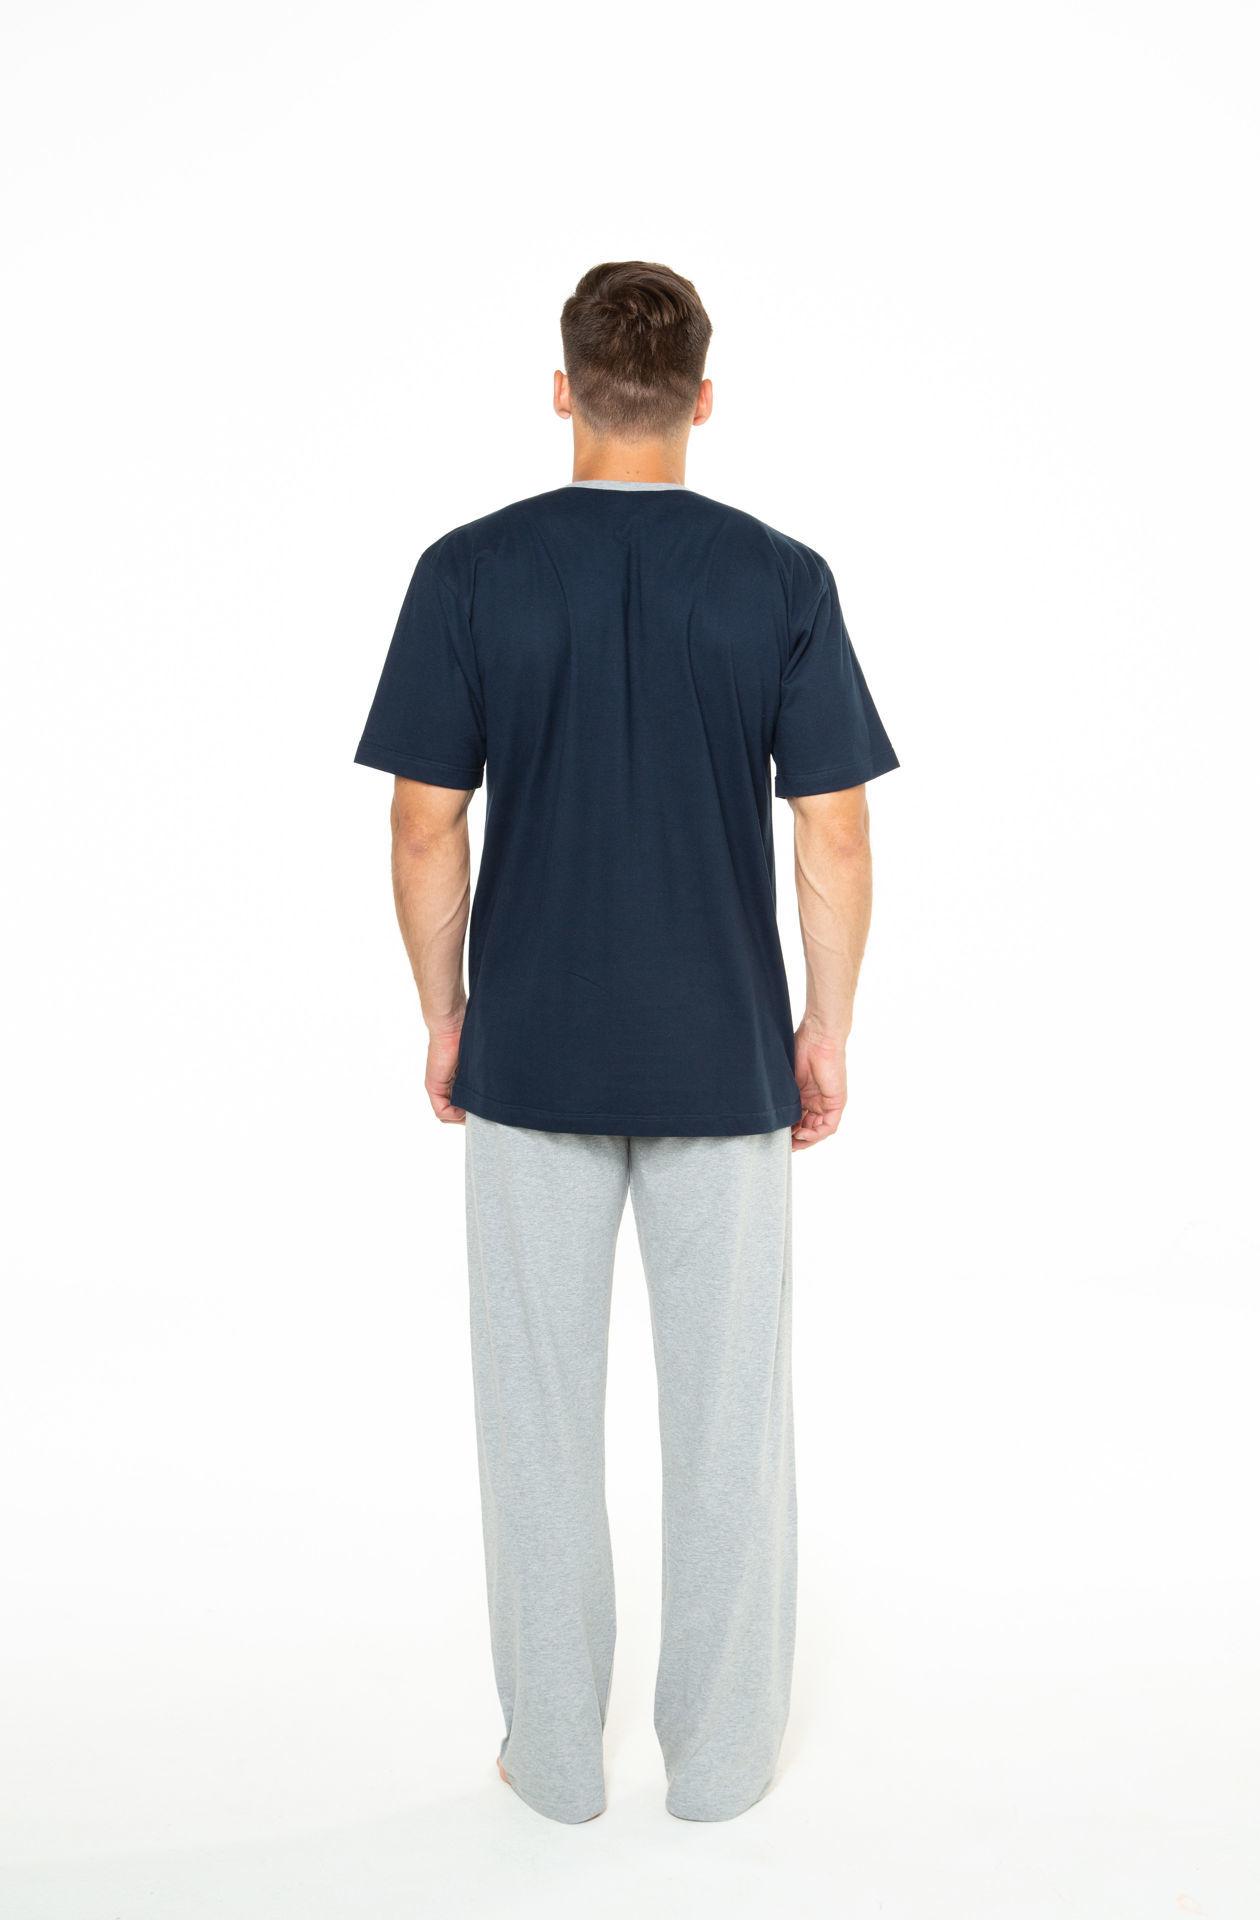 Picture of Men's pajamas